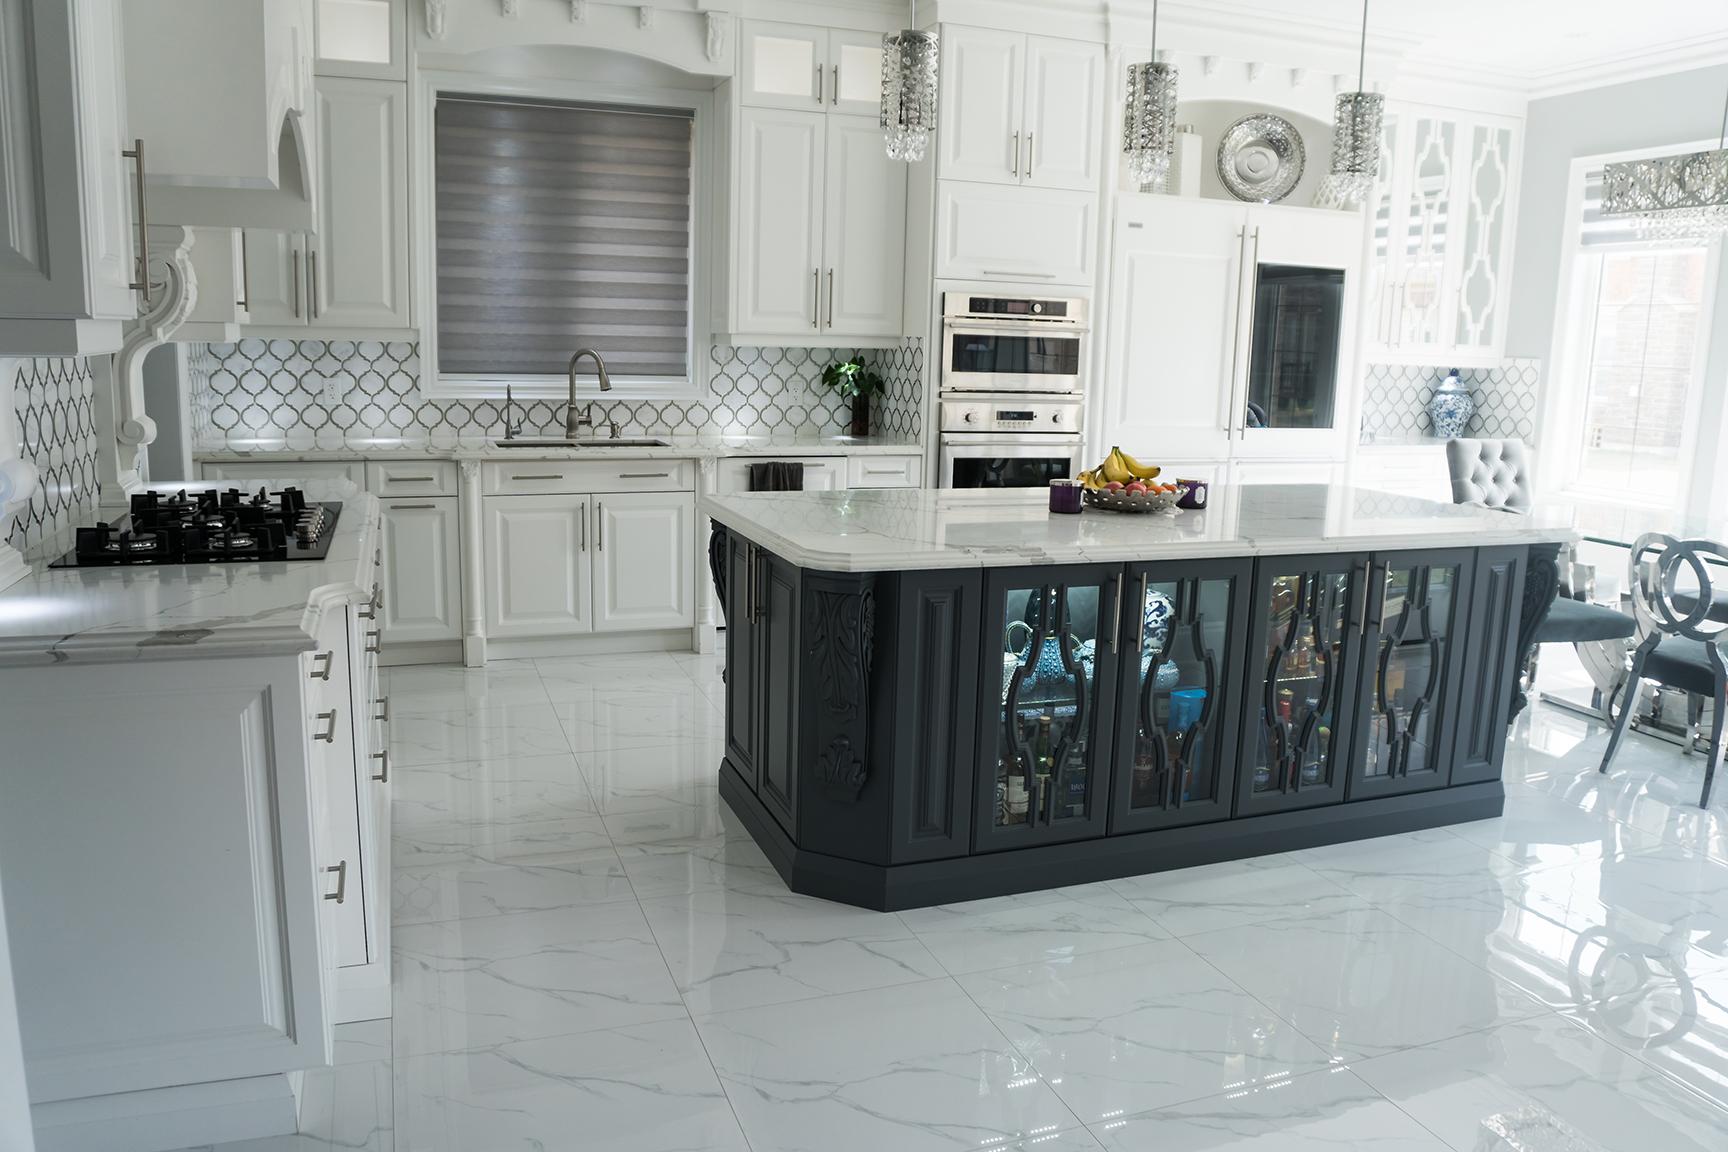 custom kitchen cabinetry food slicer oakville cabinets burlington company milton renovations mississauga cabinet refacing